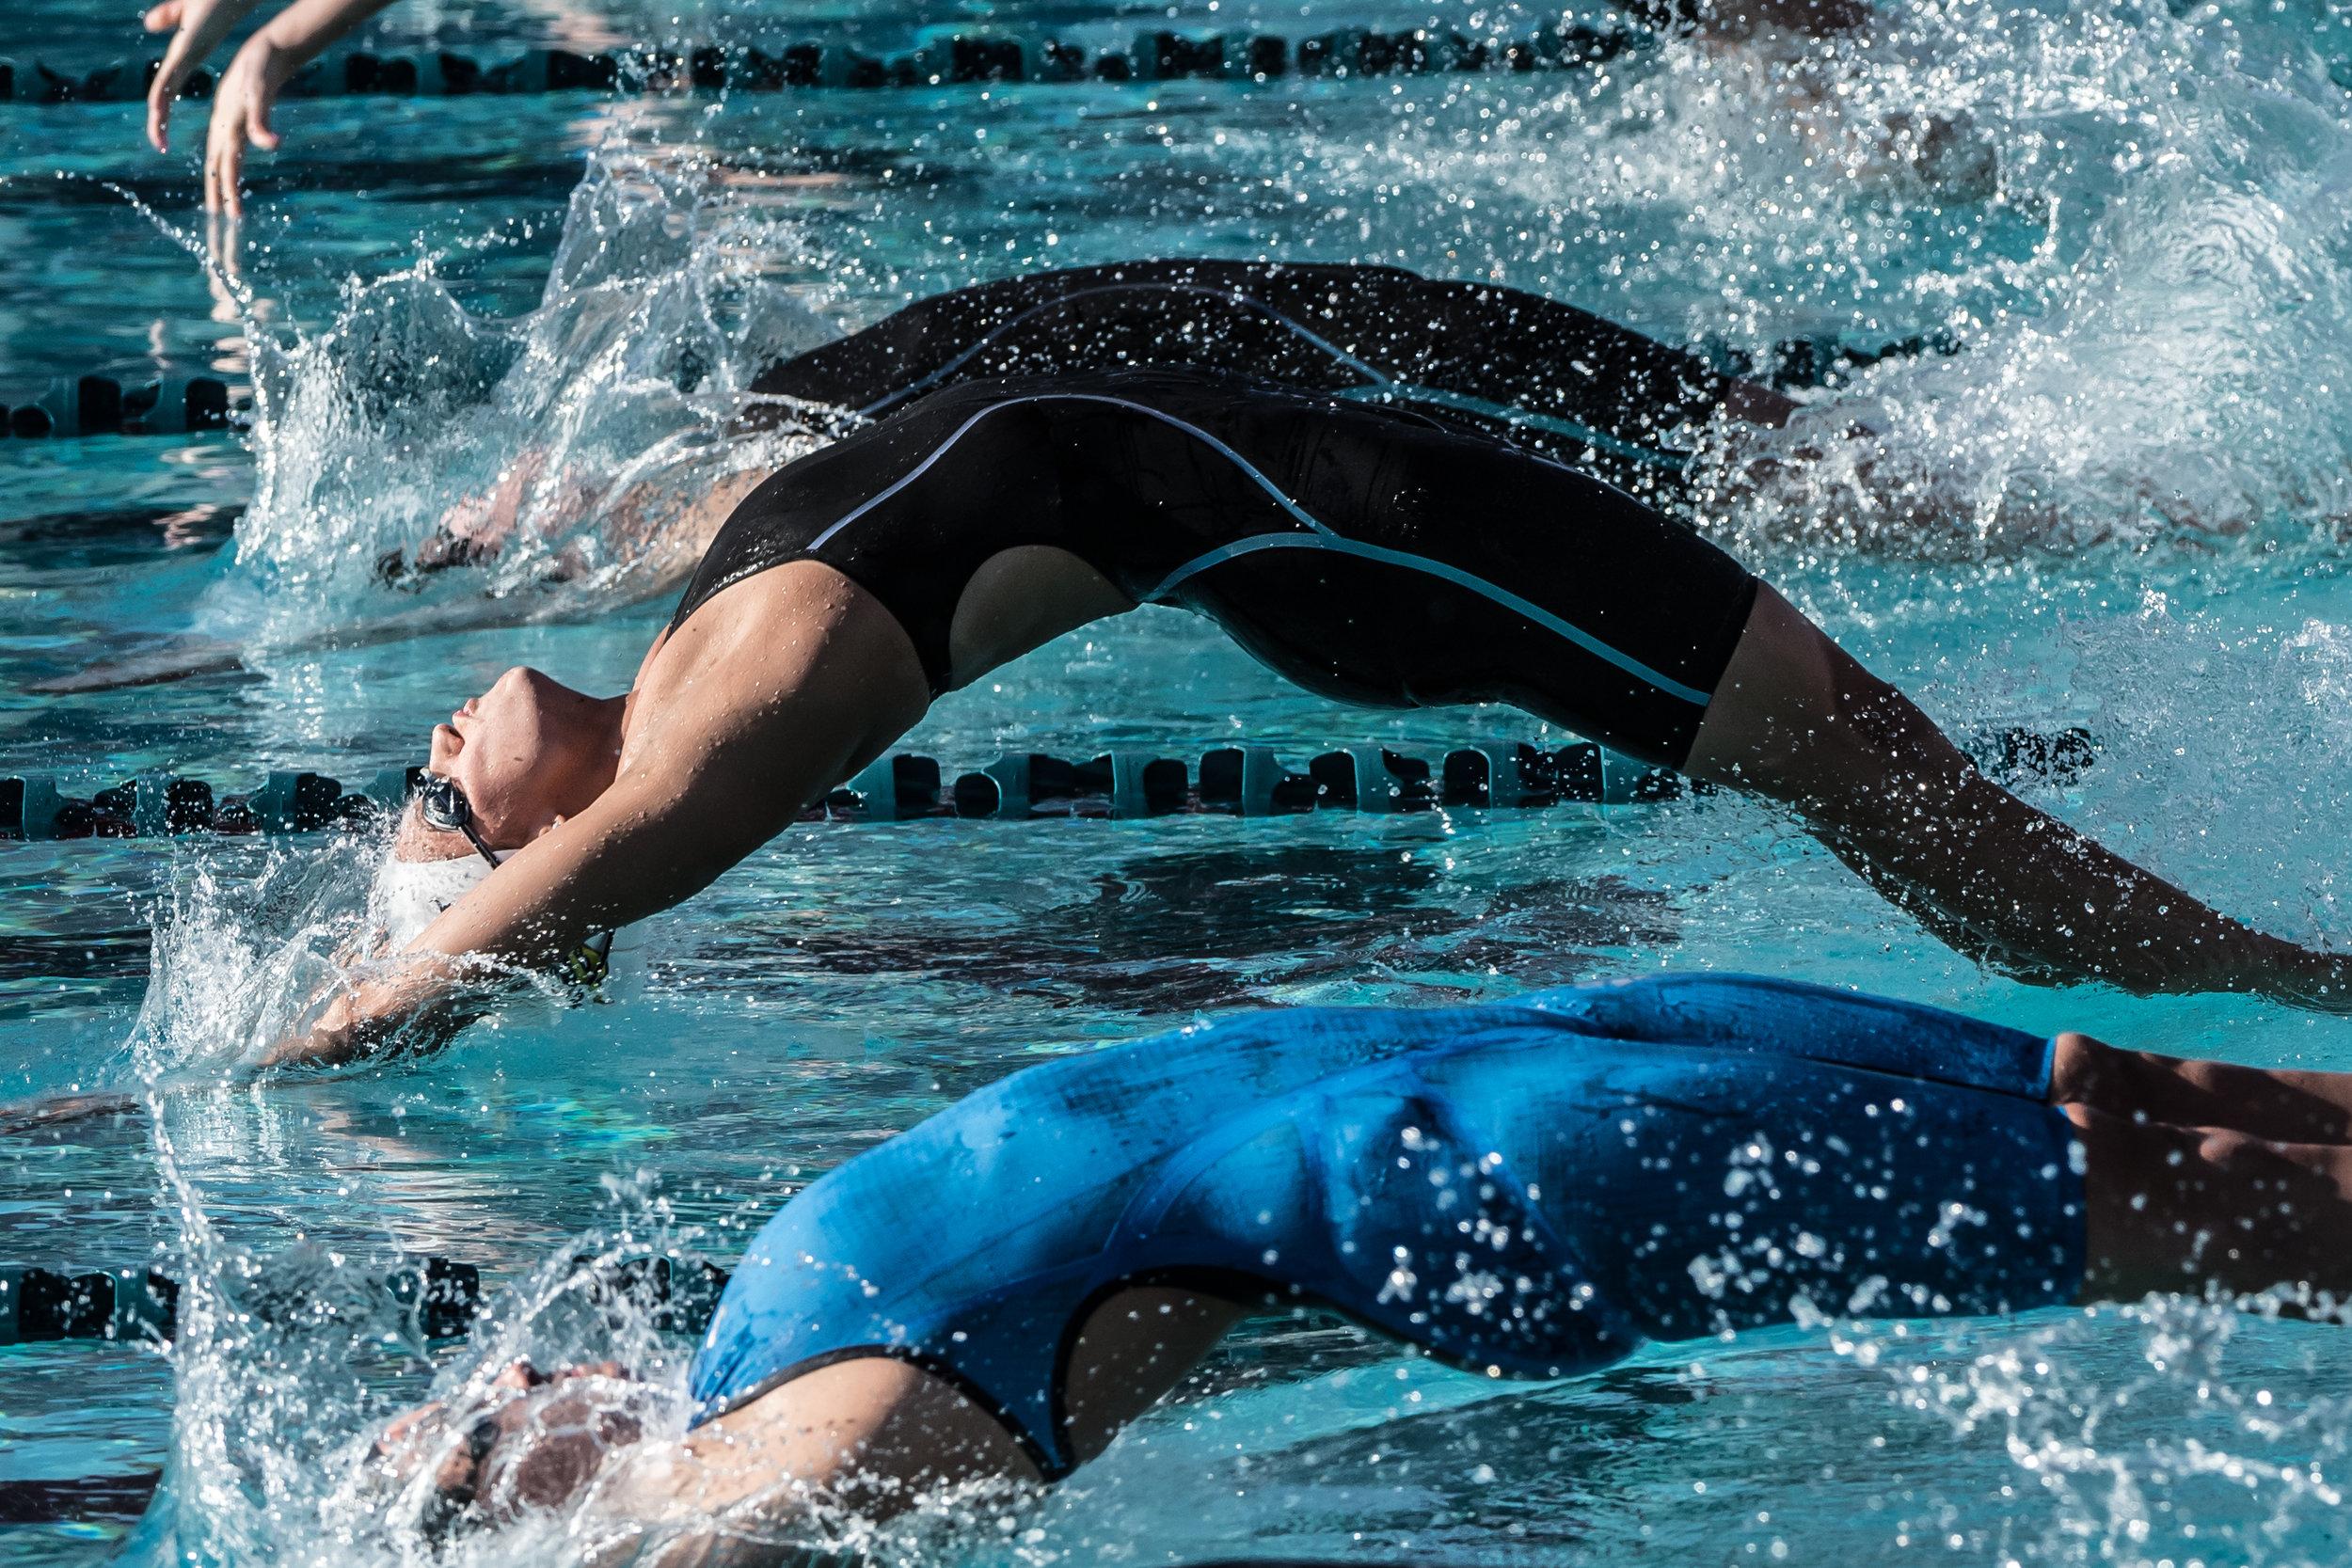 Arena Pro Swim Series Champion